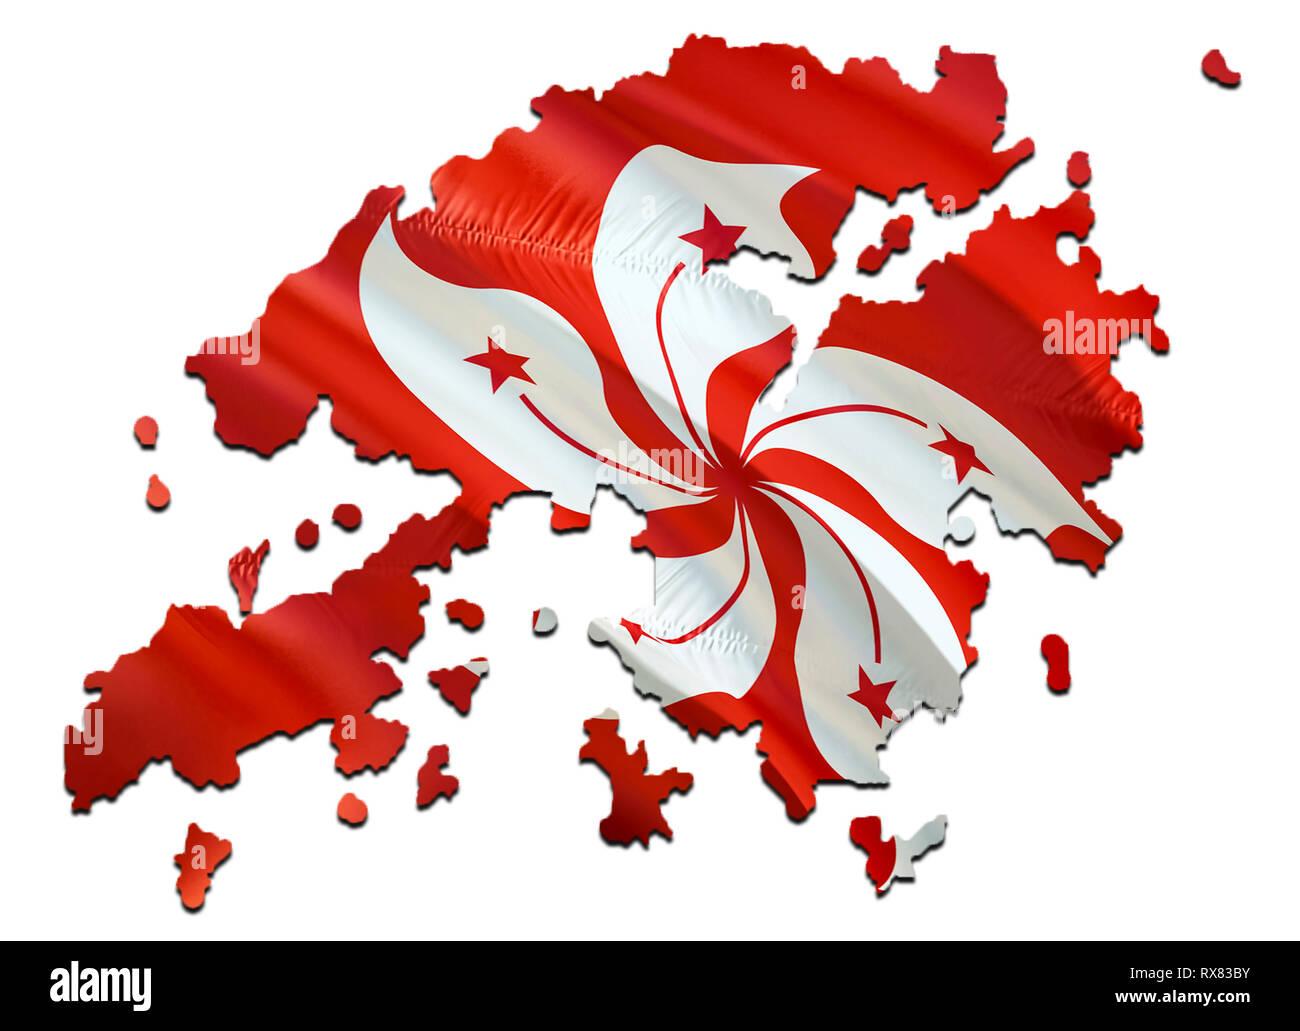 Cartina Hong Kong.Mappa Su Hong Kong Sventola Bandiera 3d Rendering Hong Kong Mappa E Sventola Bandiera Su Asia Mappa Il Simbolo Nazionale Di Hong Kong Hong Kong Bandiera Su Asia Backgro Foto Stock